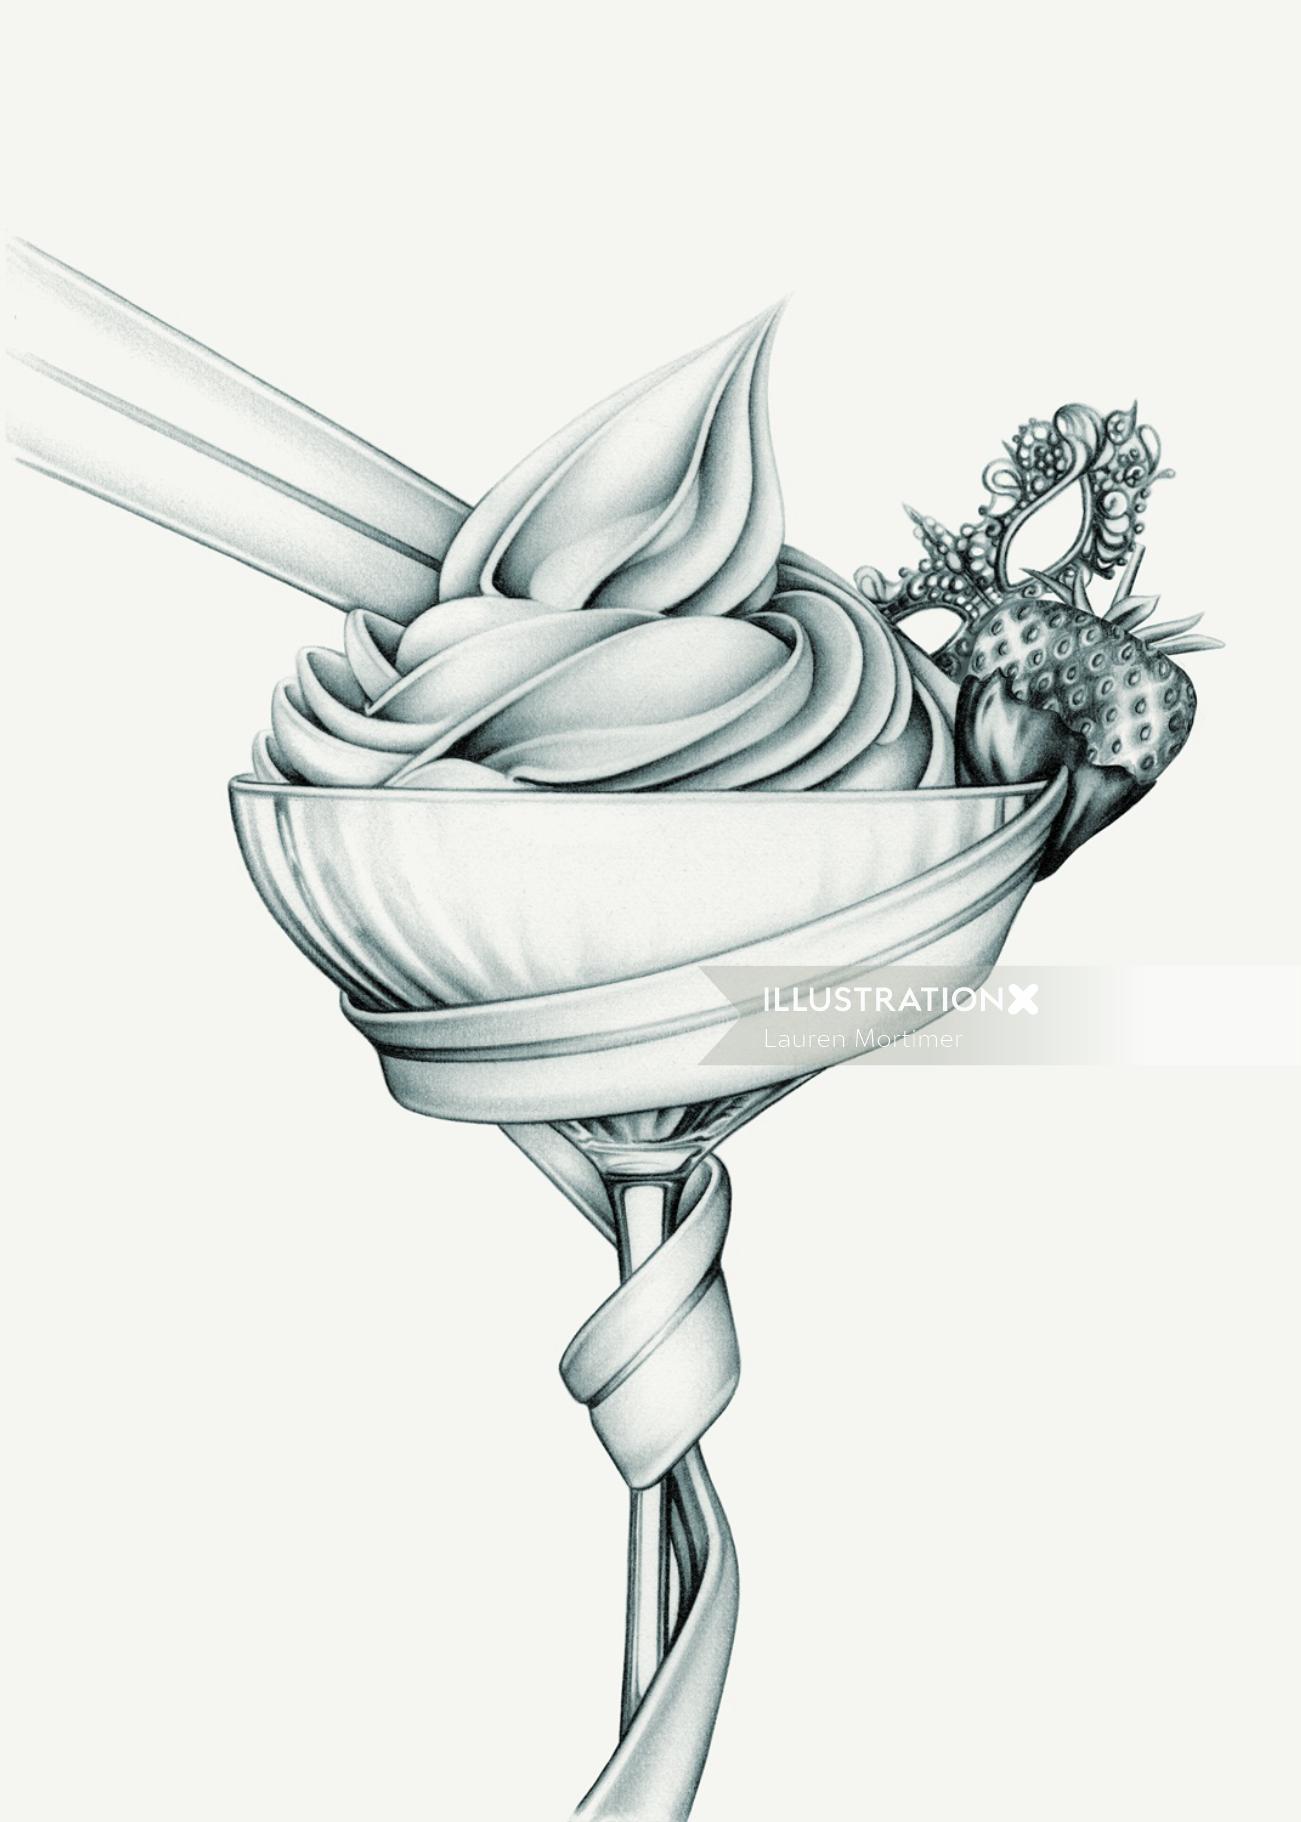 50 Shades of Grey' Cocktail Illustration